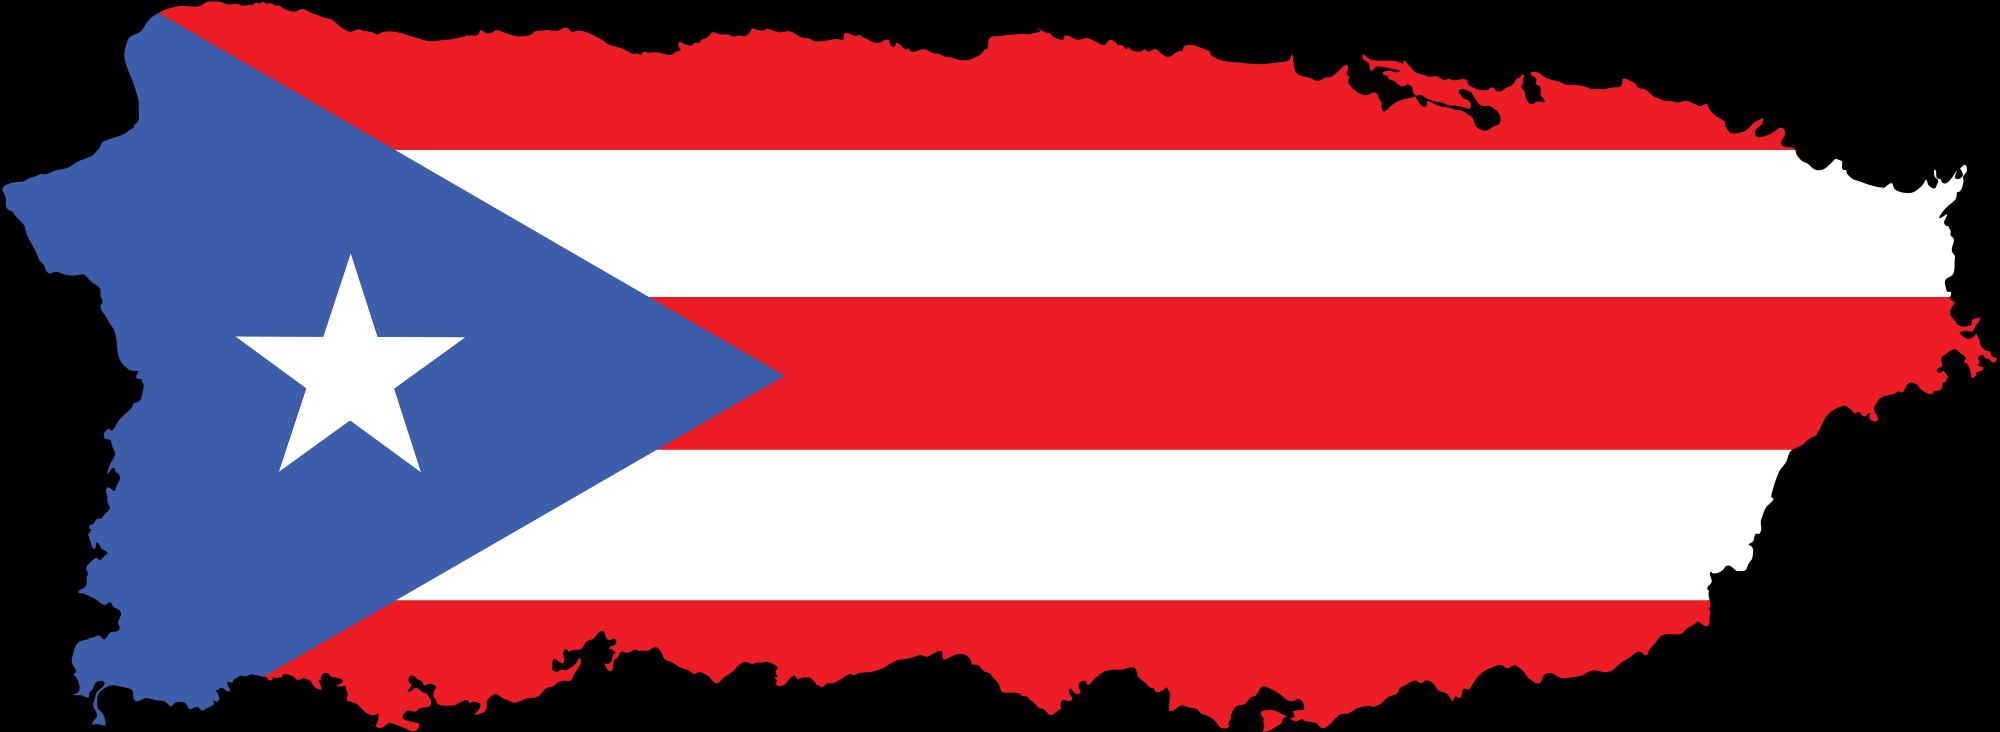 puerto rican flag drawing at getdrawings com free for personal use rh getdrawings com bandera de puerto rico clipart puerto rico outline clip art